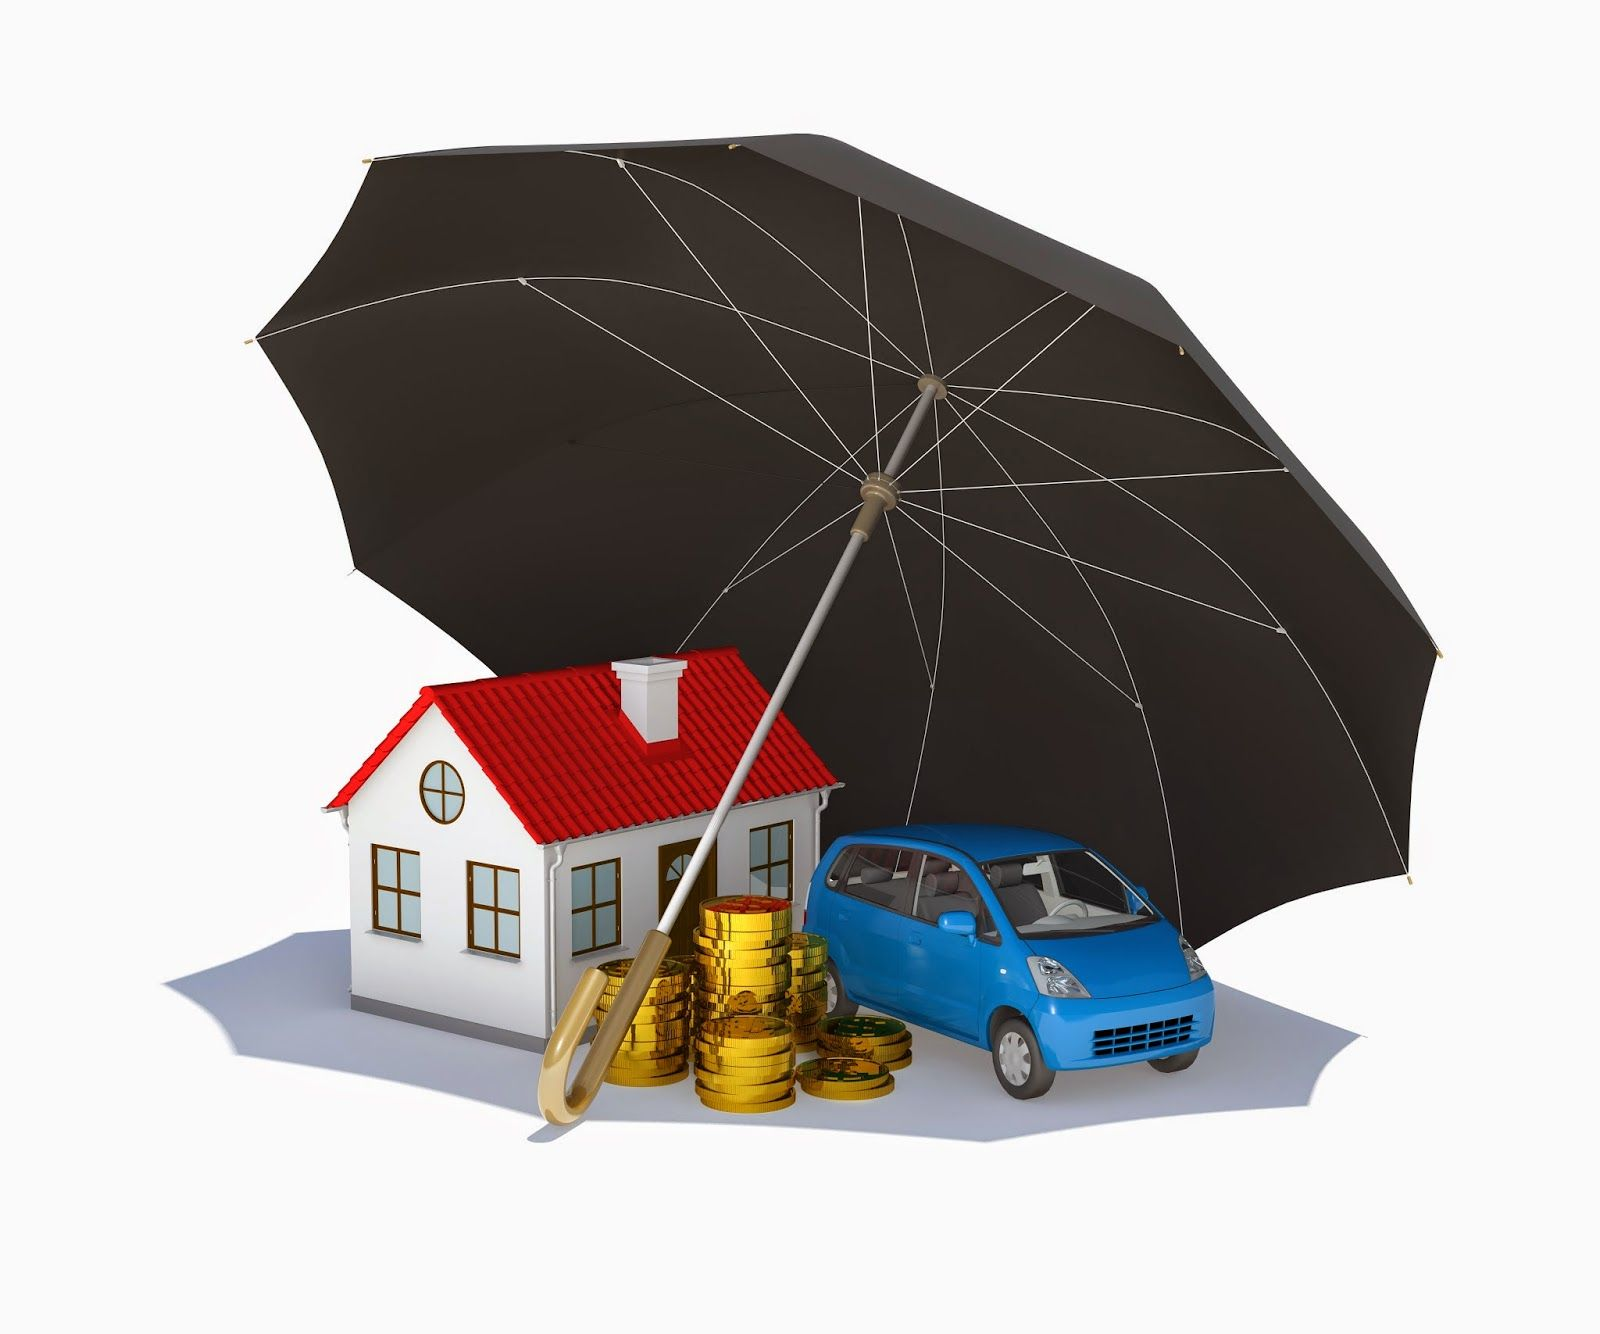 Personal Umbrella Policy Umbrella Insurance Business Insurance Car Insurance